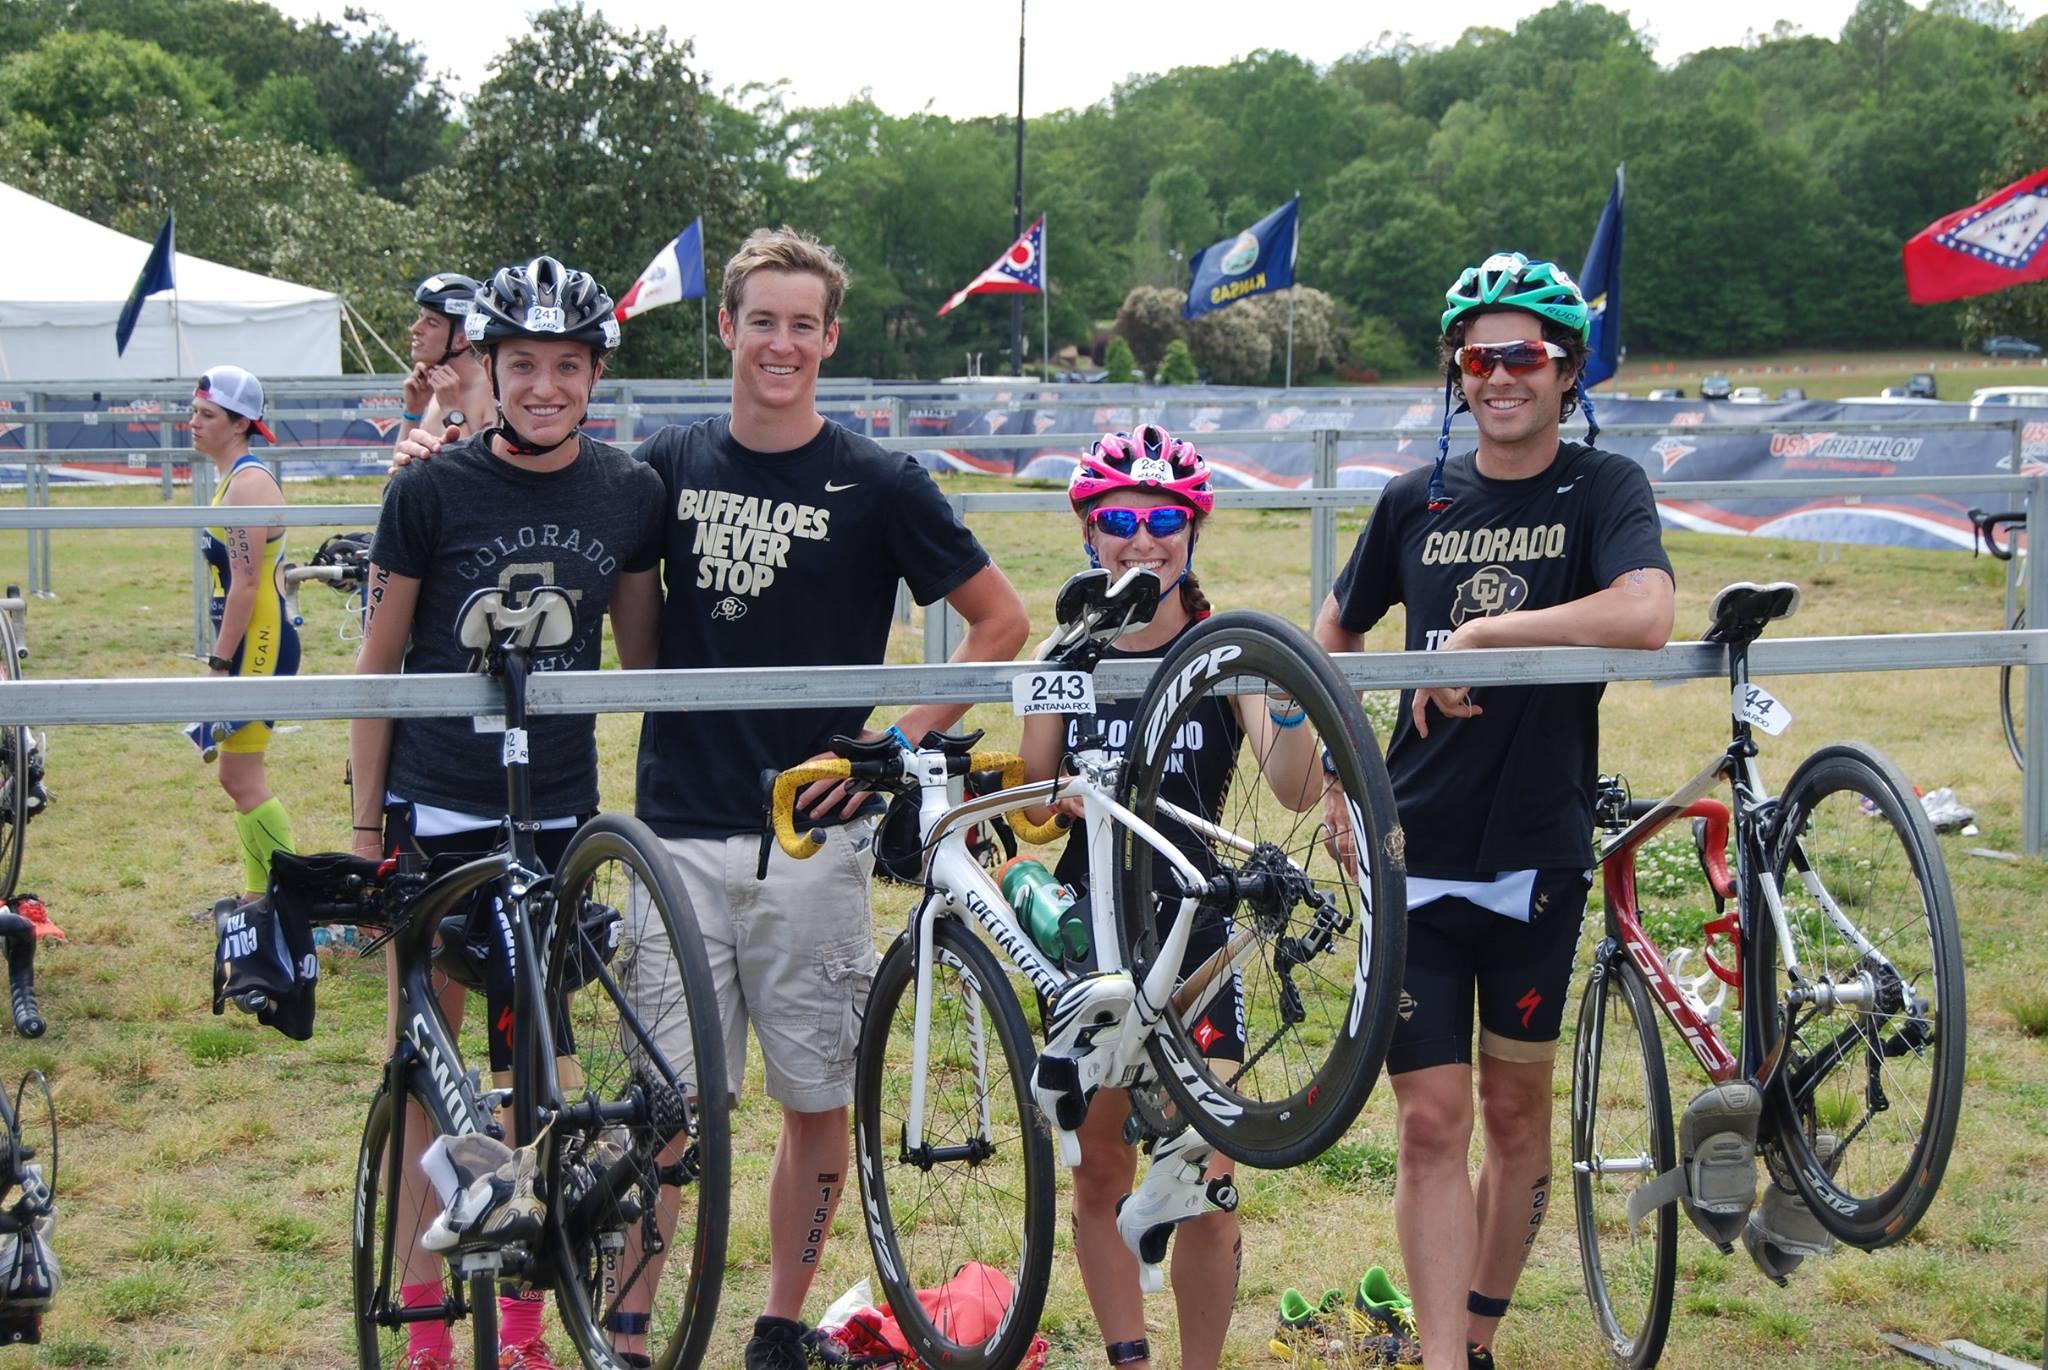 Our CU team relay: Timmy Winslow, Britt Warley, Ali Schwein, and myself